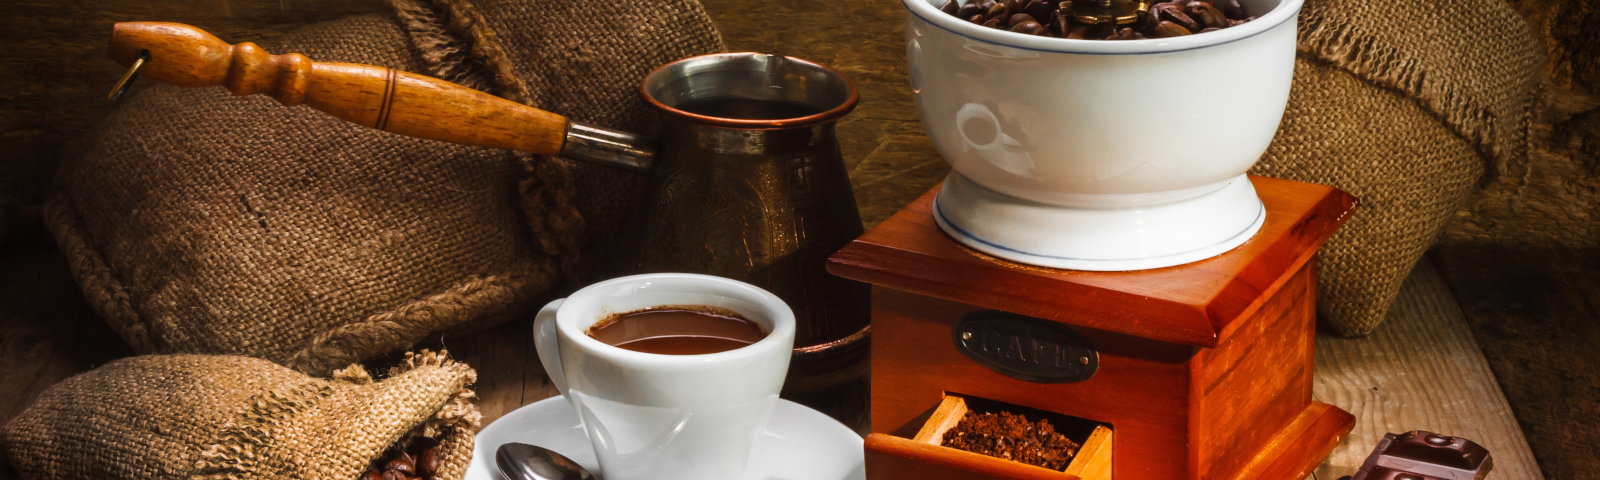 турка для кофе фото